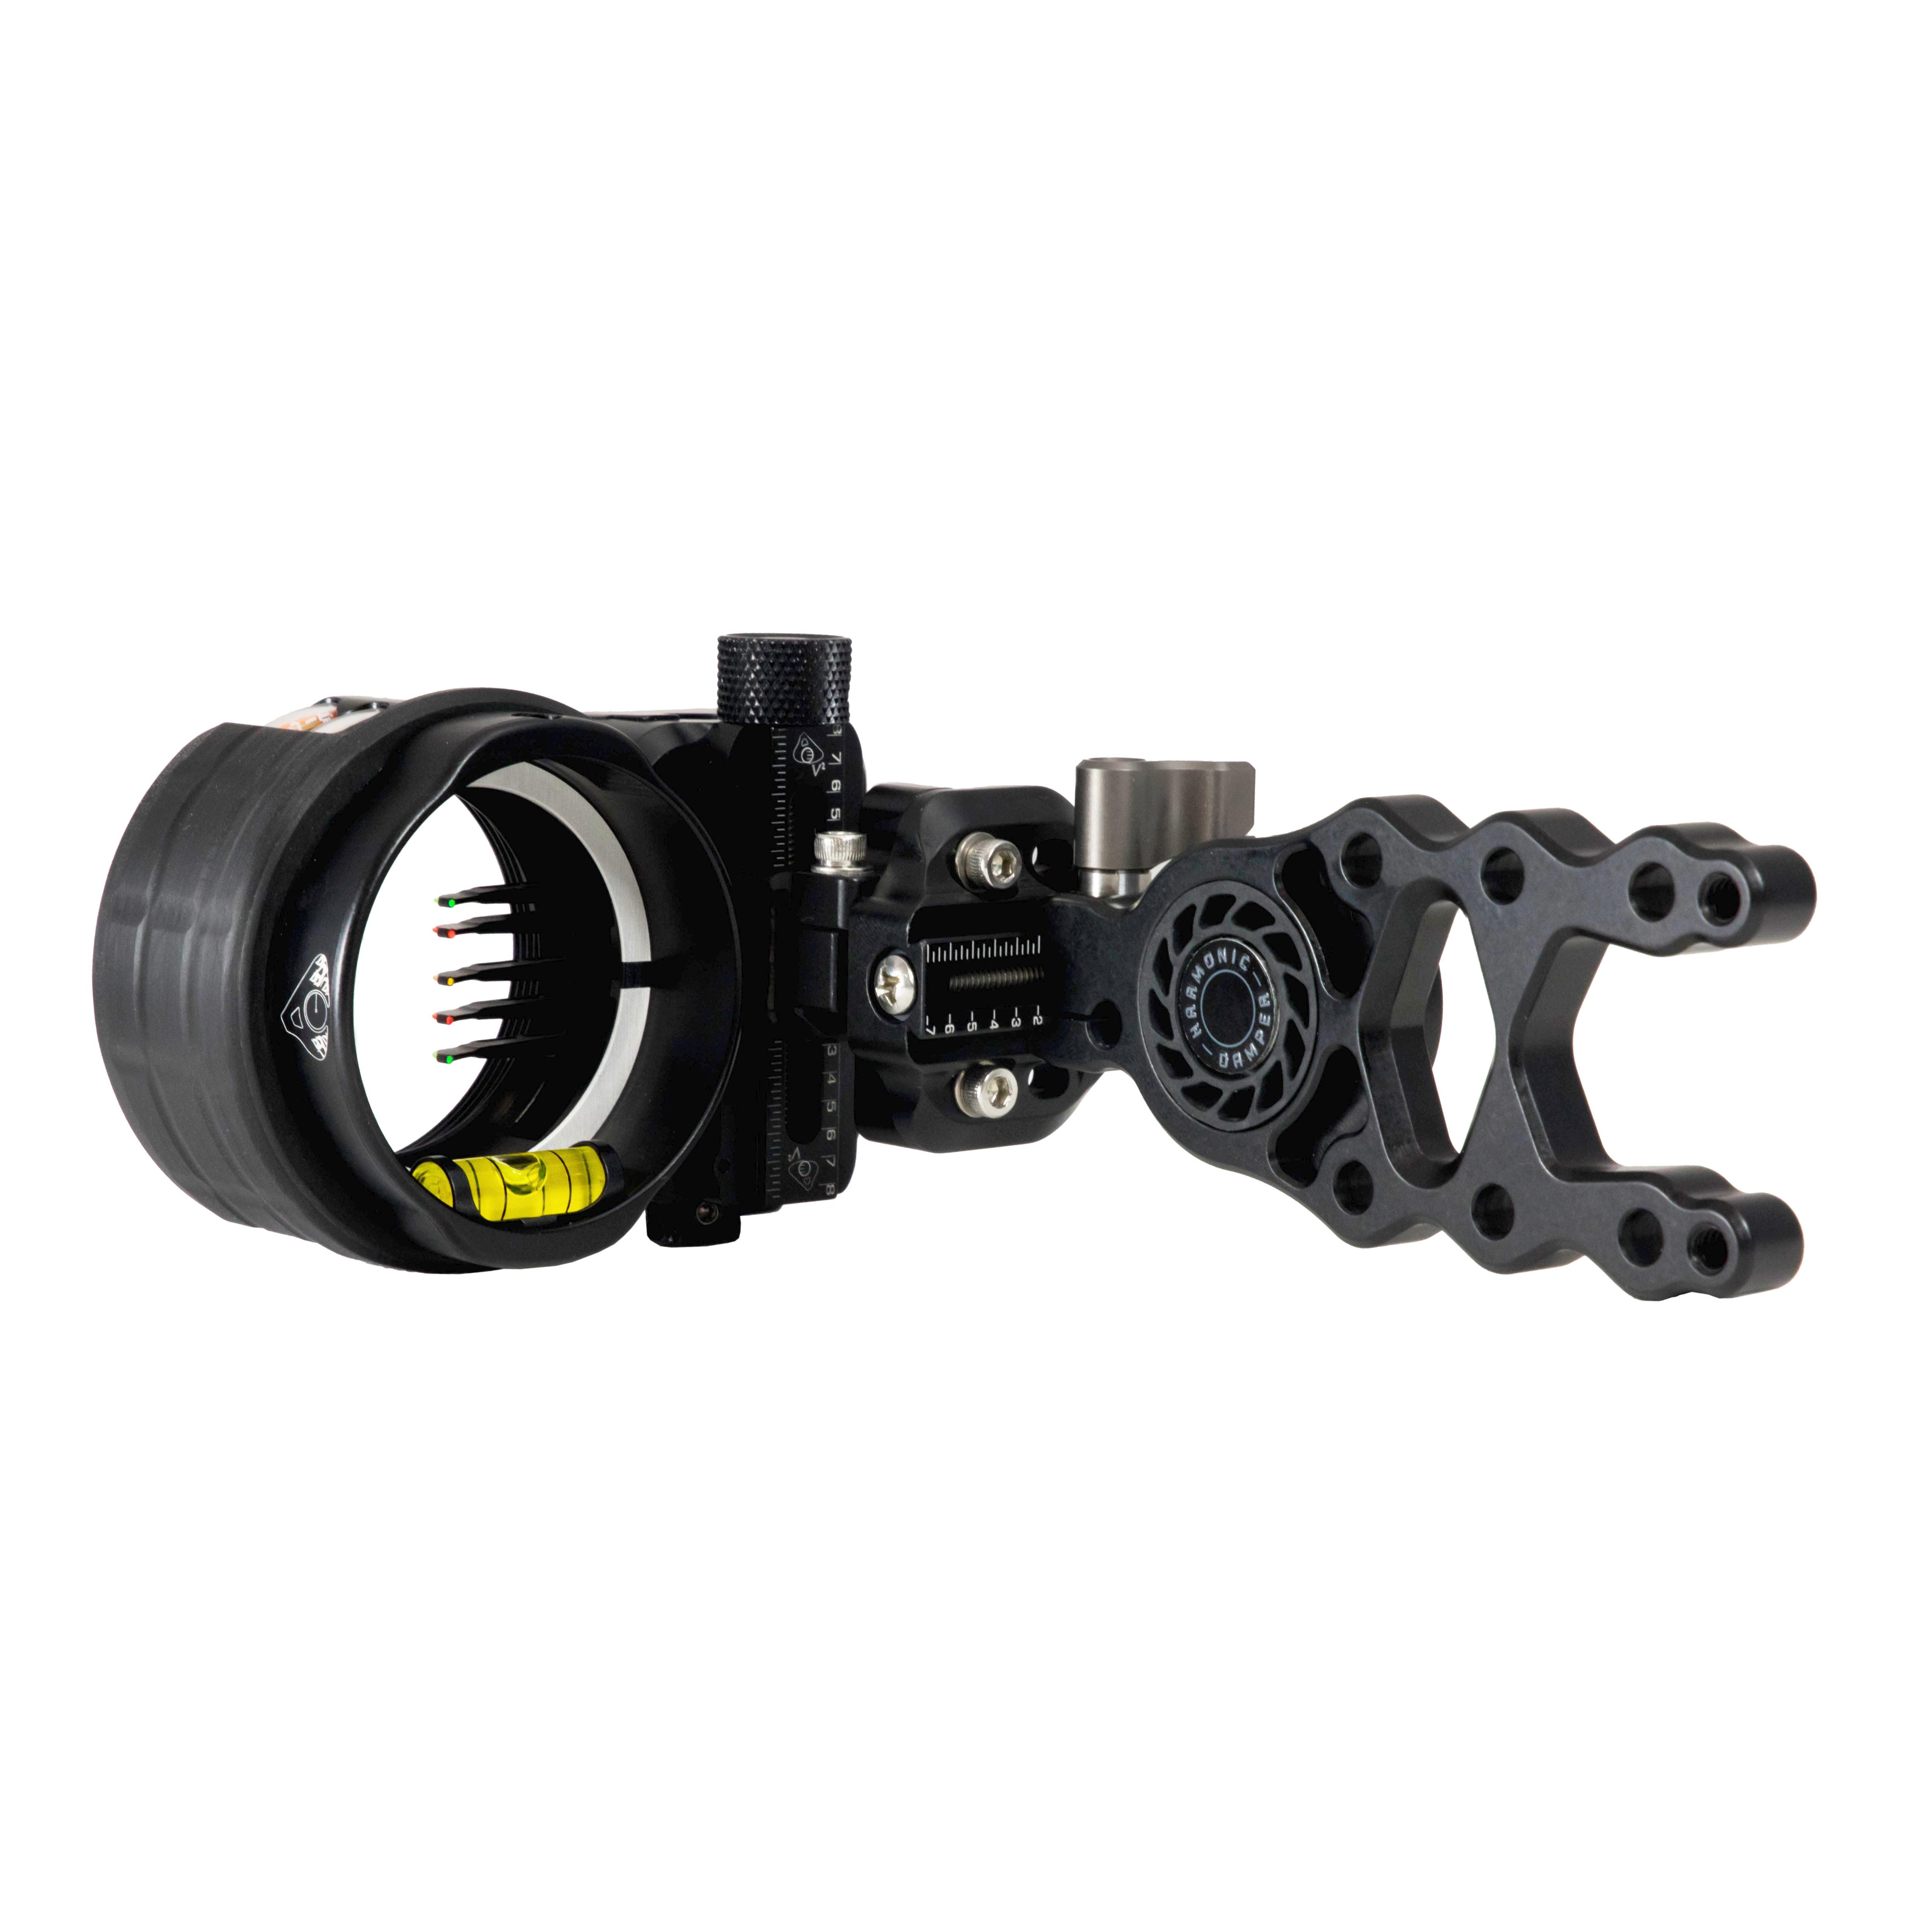 AXCEL RheoTech HD 5针 .010带遮光罩猎瞄